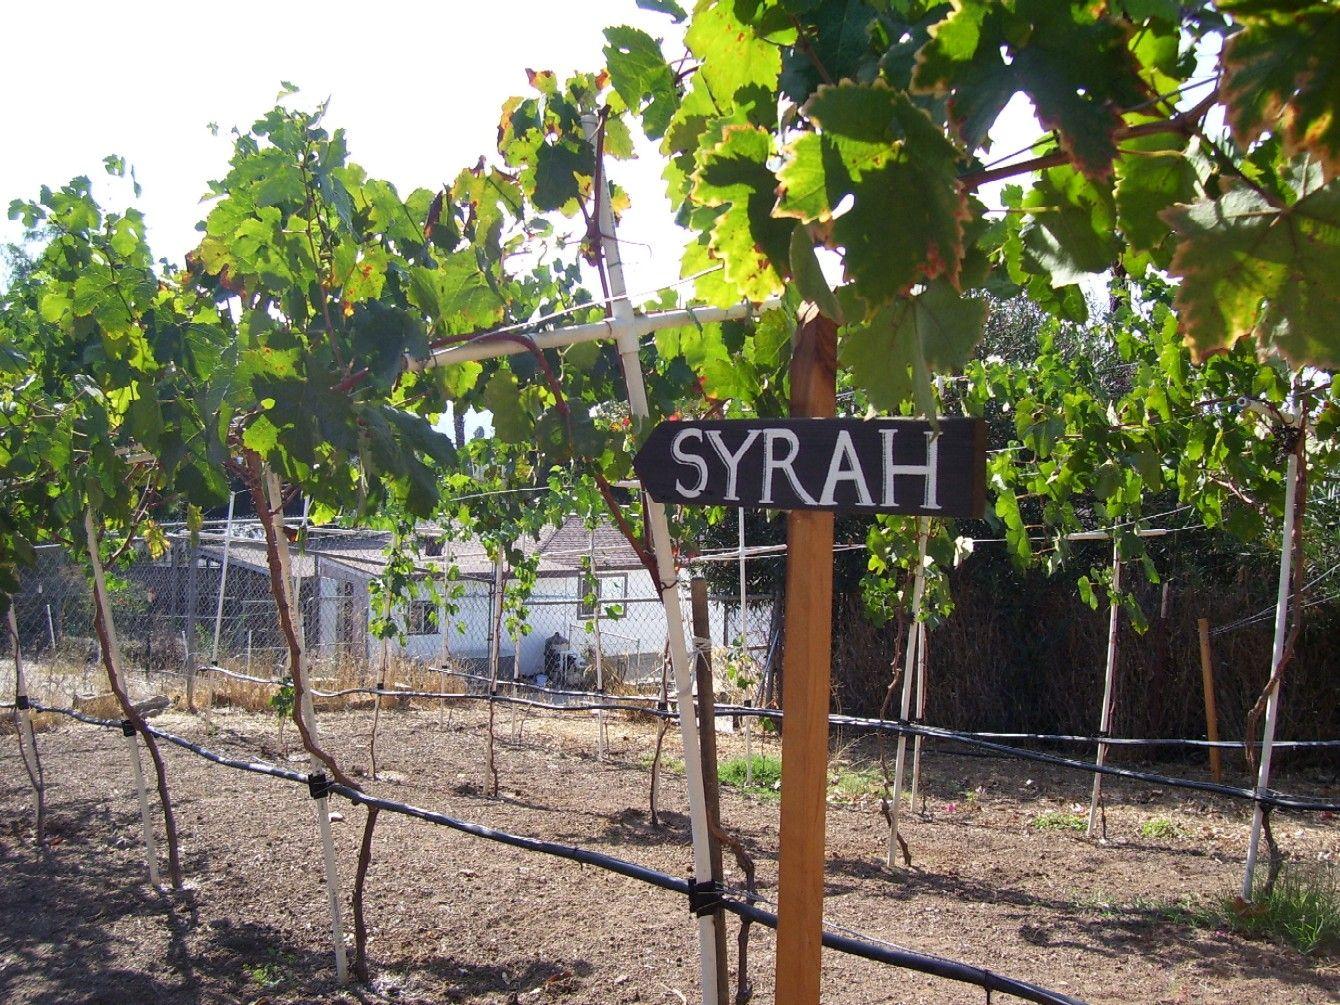 syrah section of my backyard vineyard backyard vineyard for